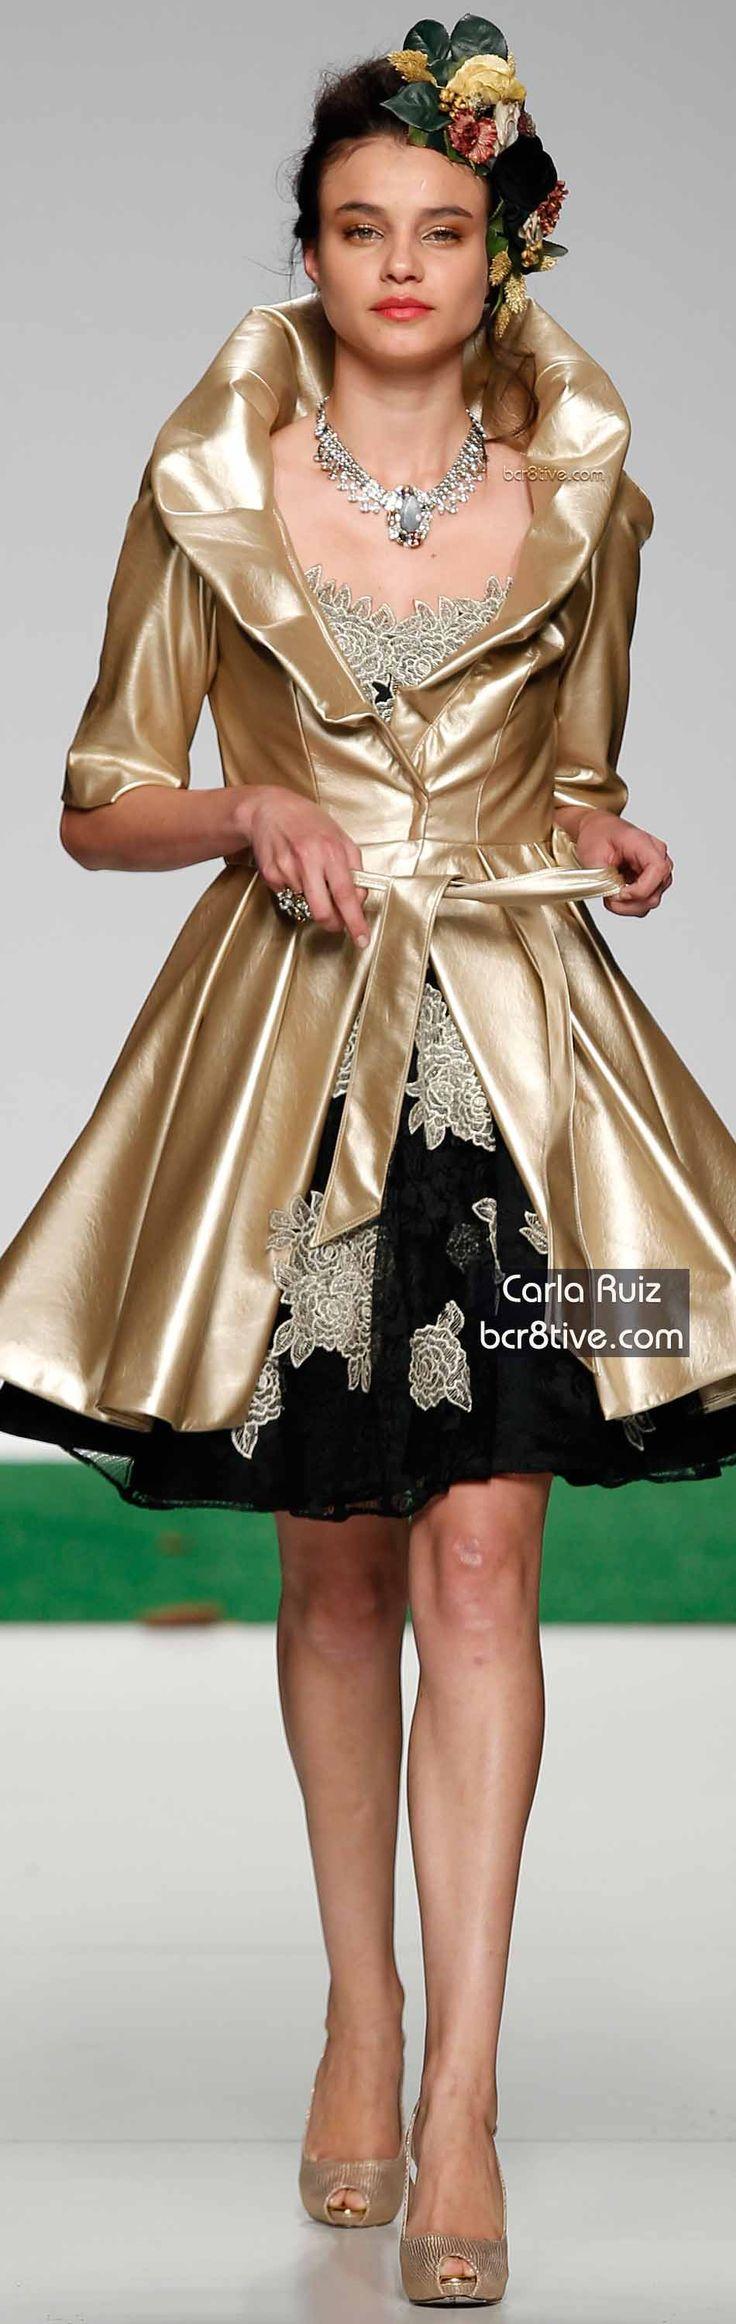 13 best new dresses1111 images on pinterest vintage - Carla ruiz valencia ...